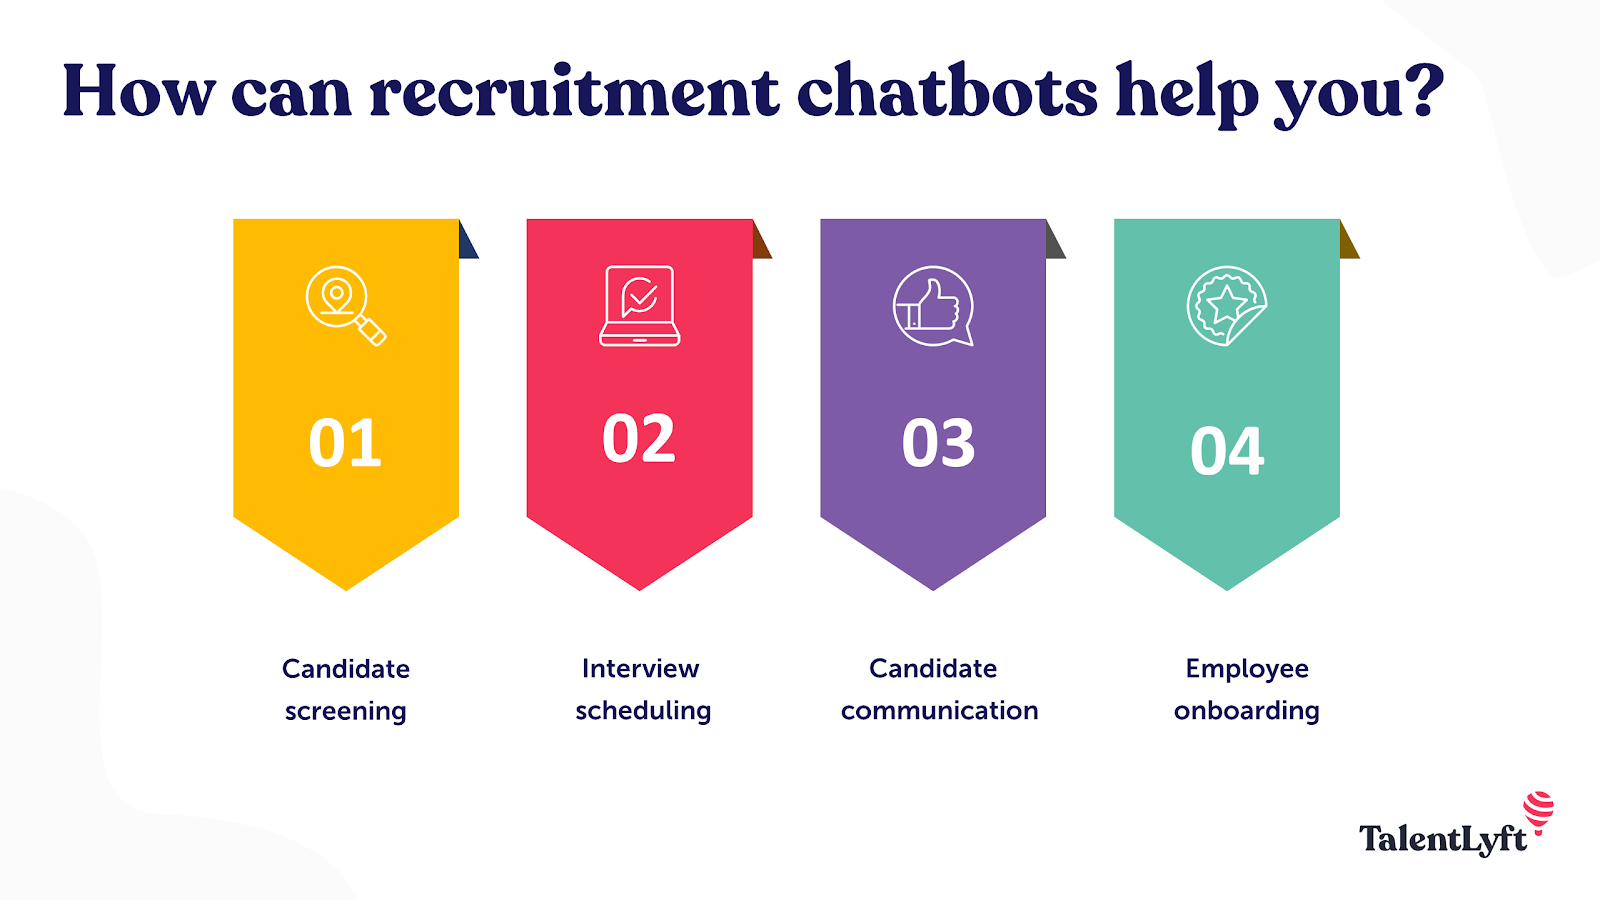 Recruitment chatbots